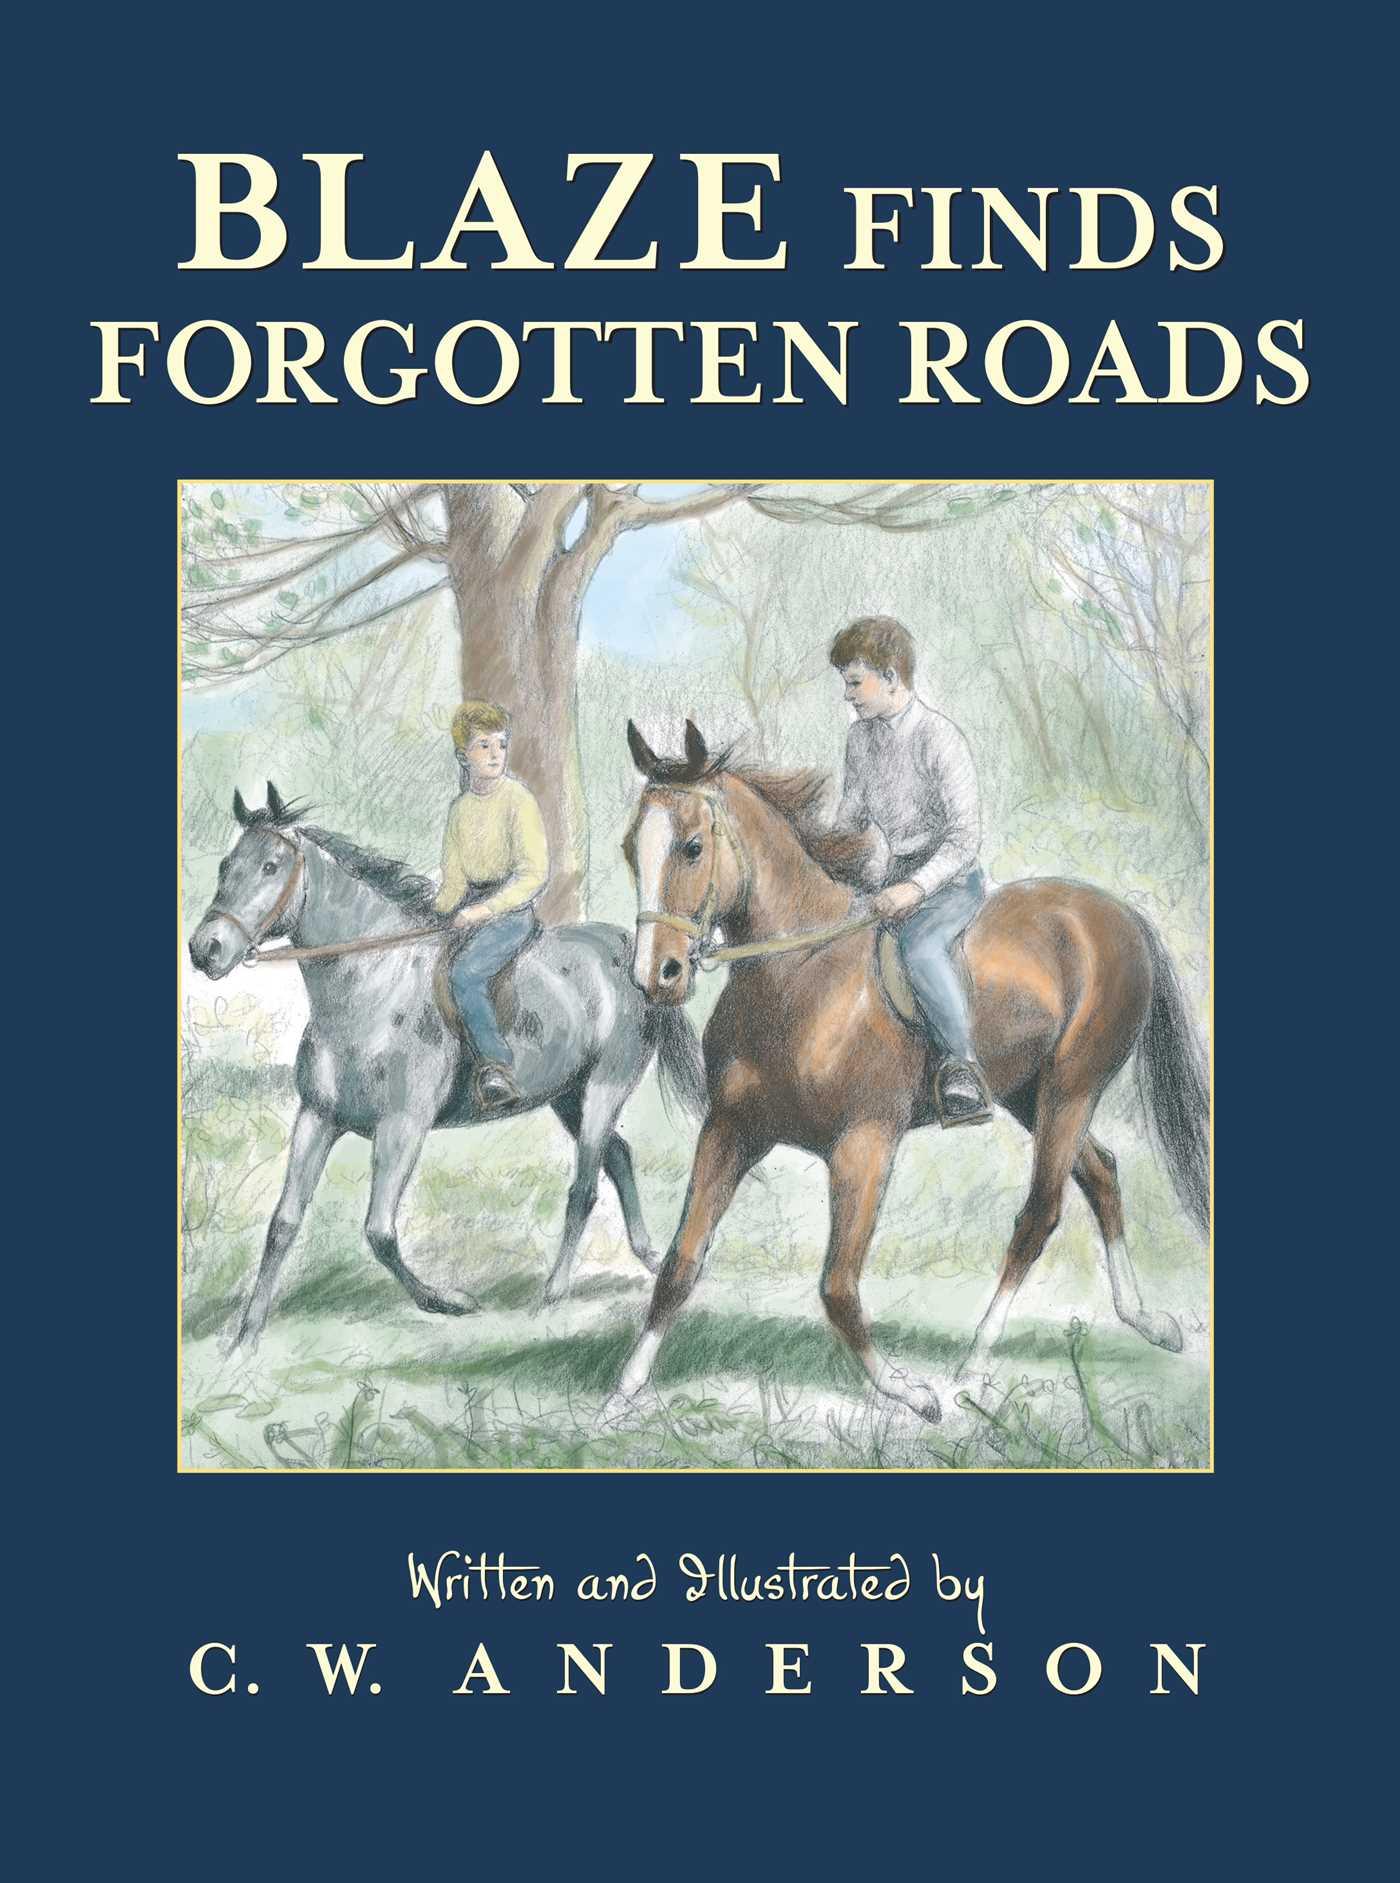 Blaze finds forgotten roads 9781442468337 hr